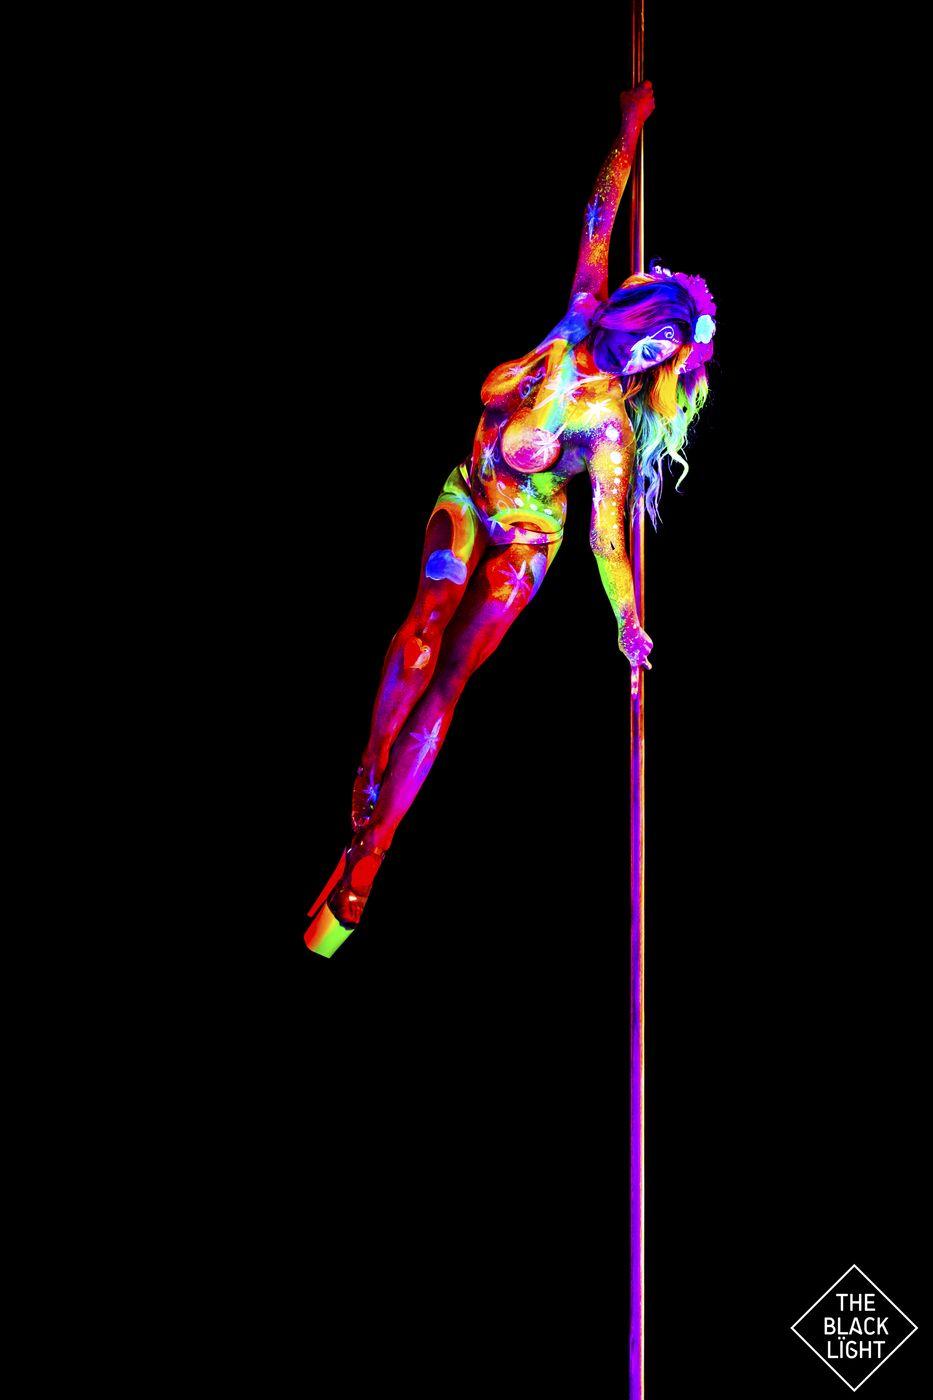 The Black Light - SUMMER Neon 1403 small.jpg